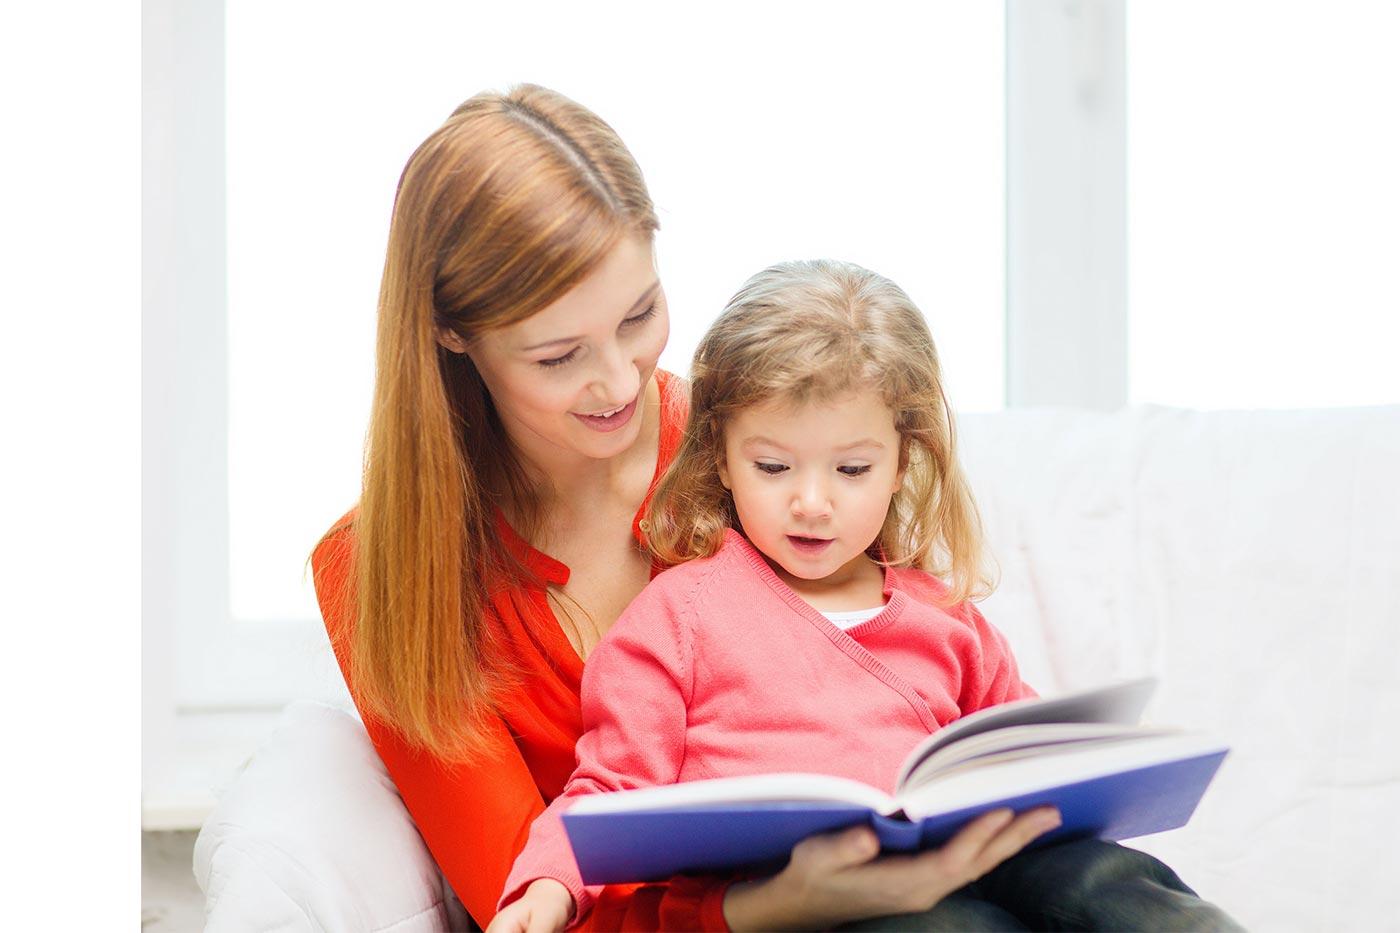 Teaching your child empathy